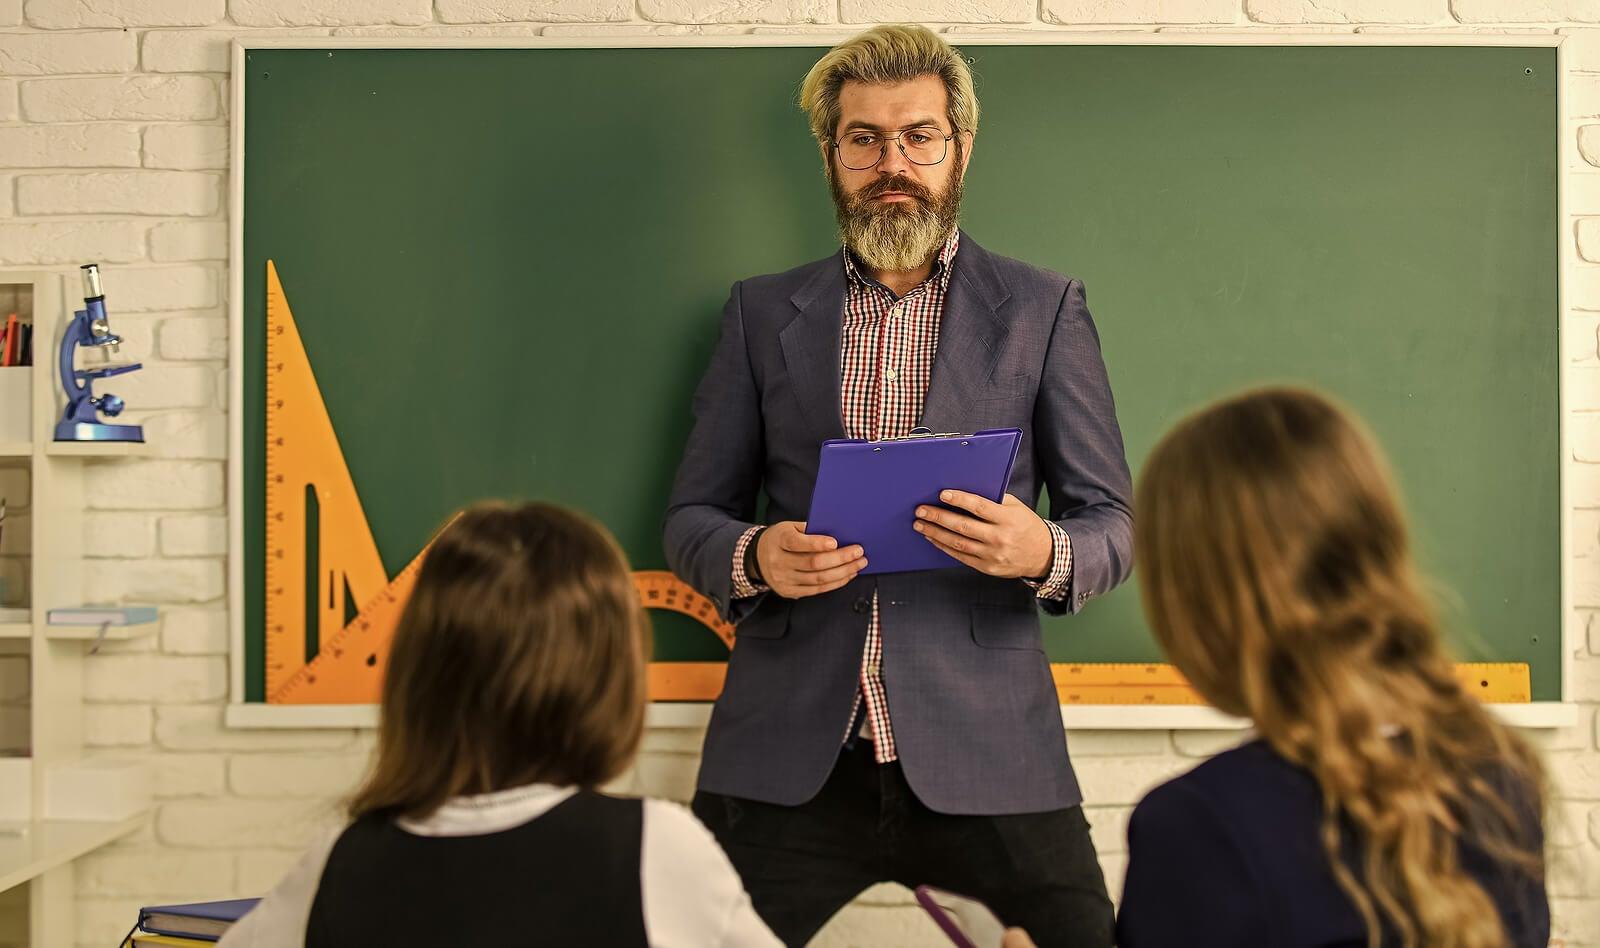 Profesor dando clase a sus alumnos con diferentes estilos de enseñanza.